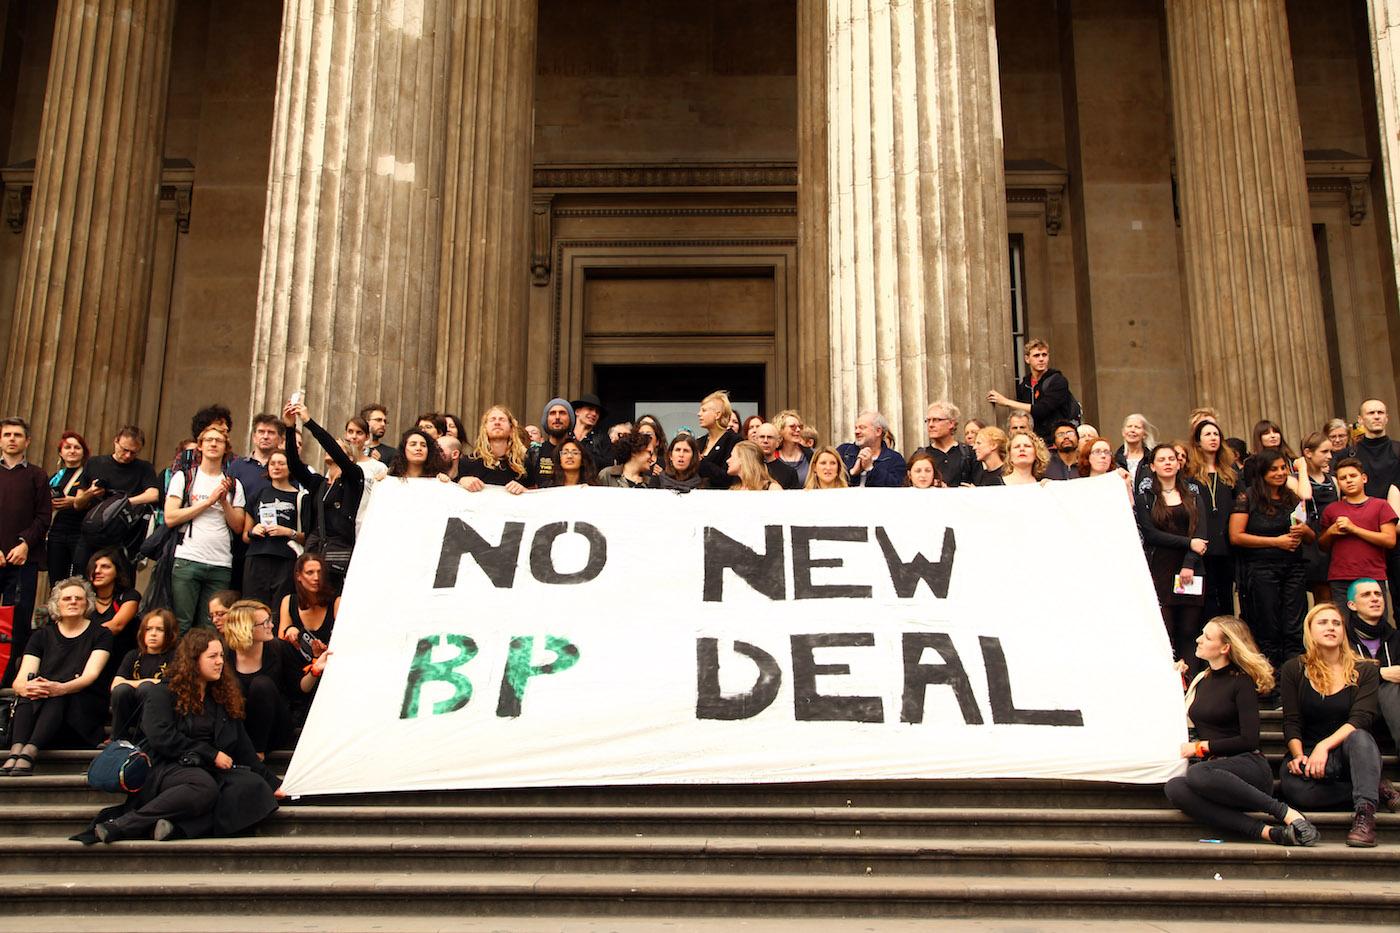 BP protestors outside the British Museum last year (photo by Natasha Quarmby)